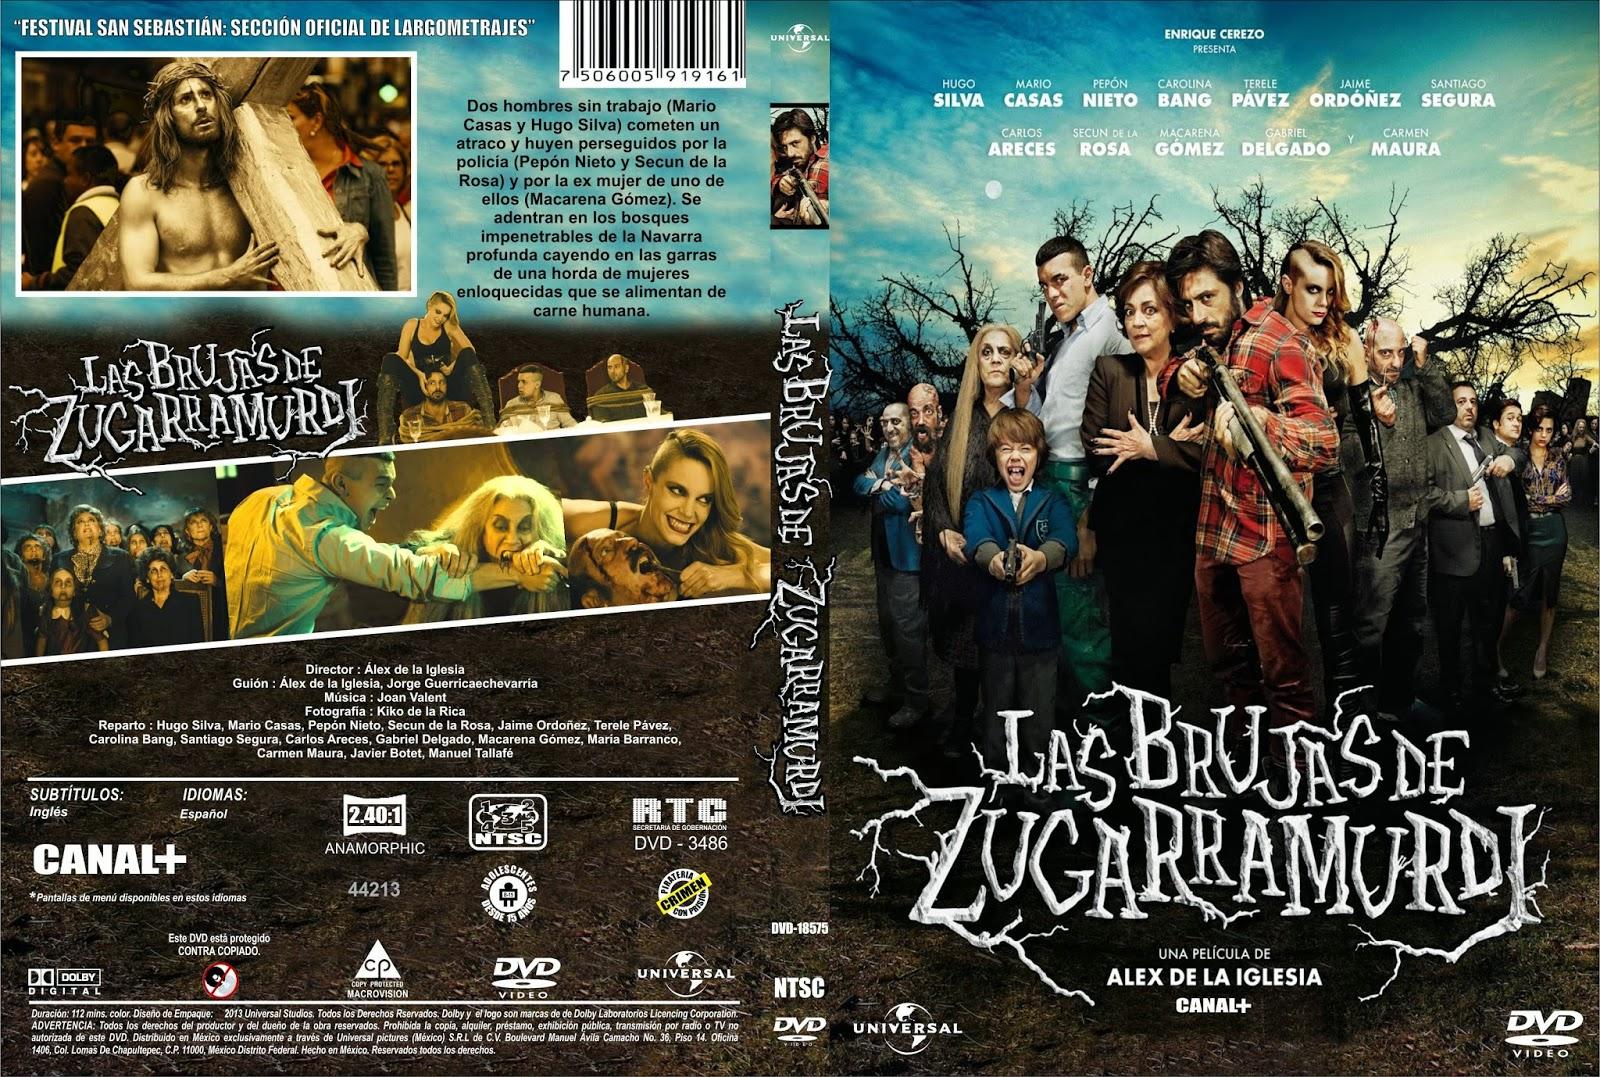 Las Brujas De Zugarramurdi DVD